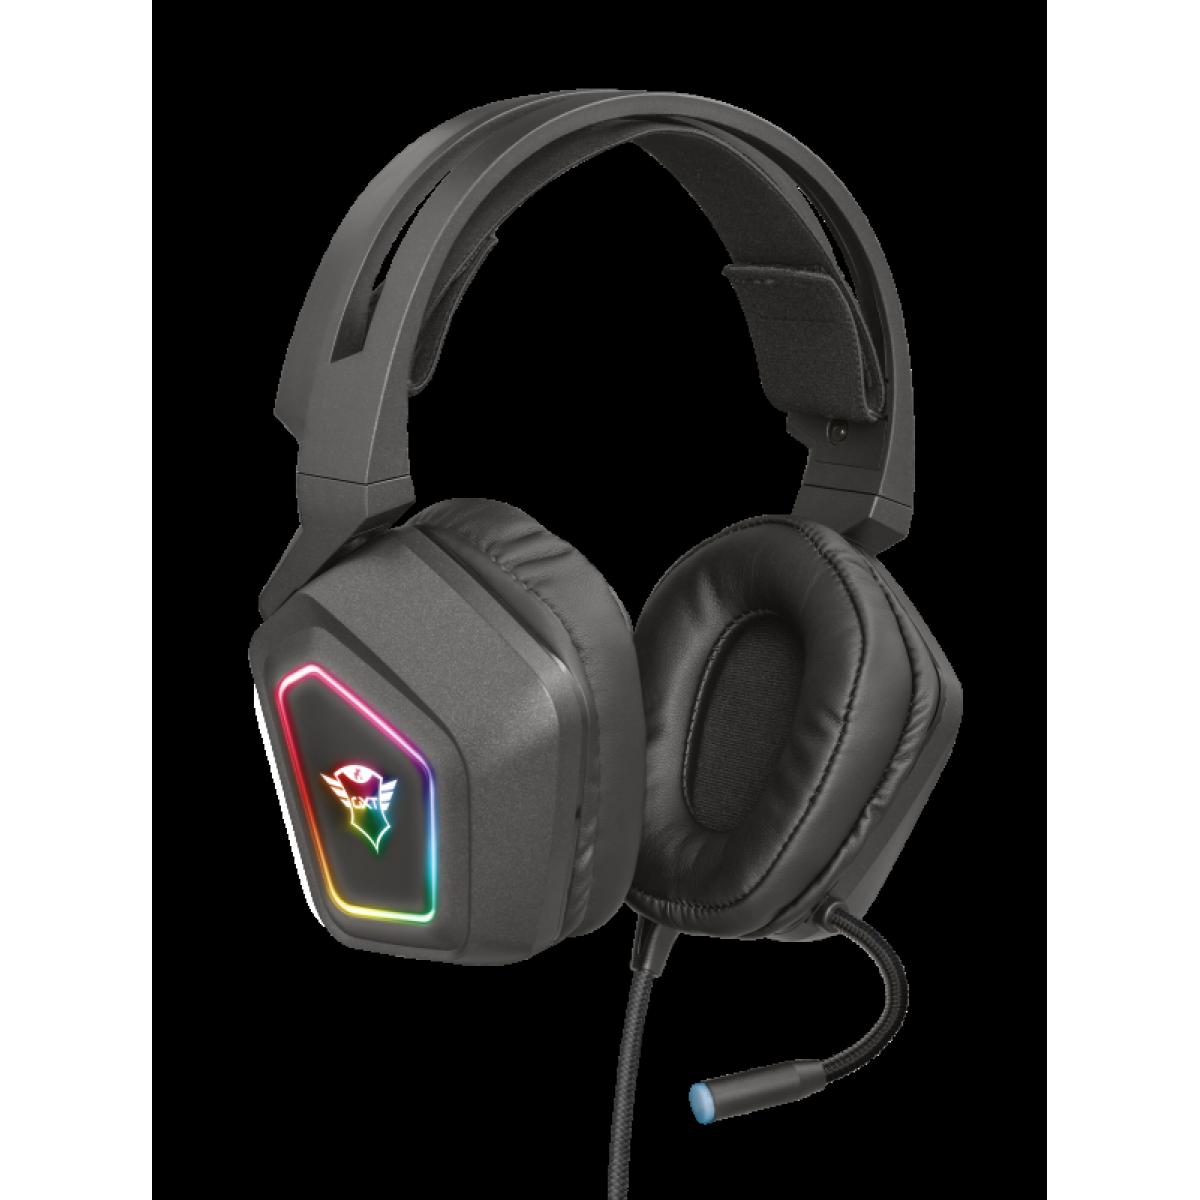 Headset Gamer Trust Blizz 7.1 RGB, PC e Laptop, GXT450